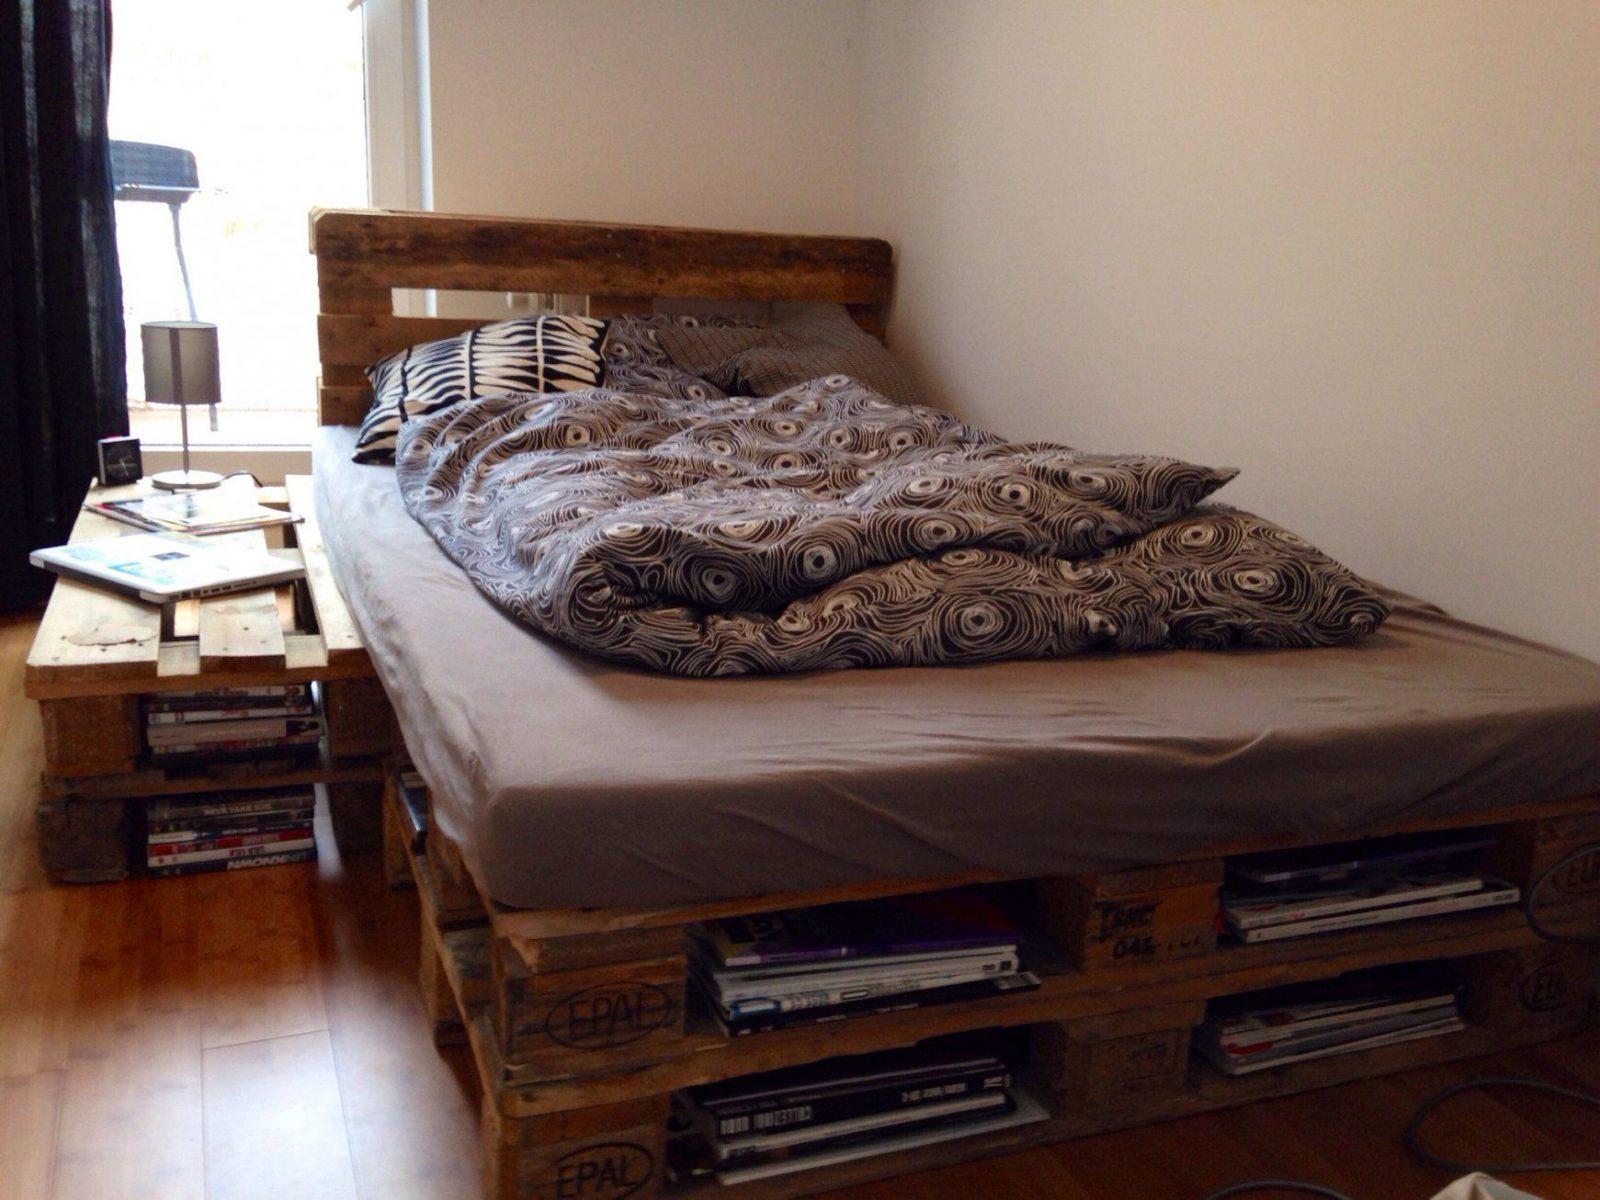 Wunderschöne Europaletten Bett Bauen So Kann Man Alte Paletten Auch von Europaletten Bett Bauen 140X200 Photo